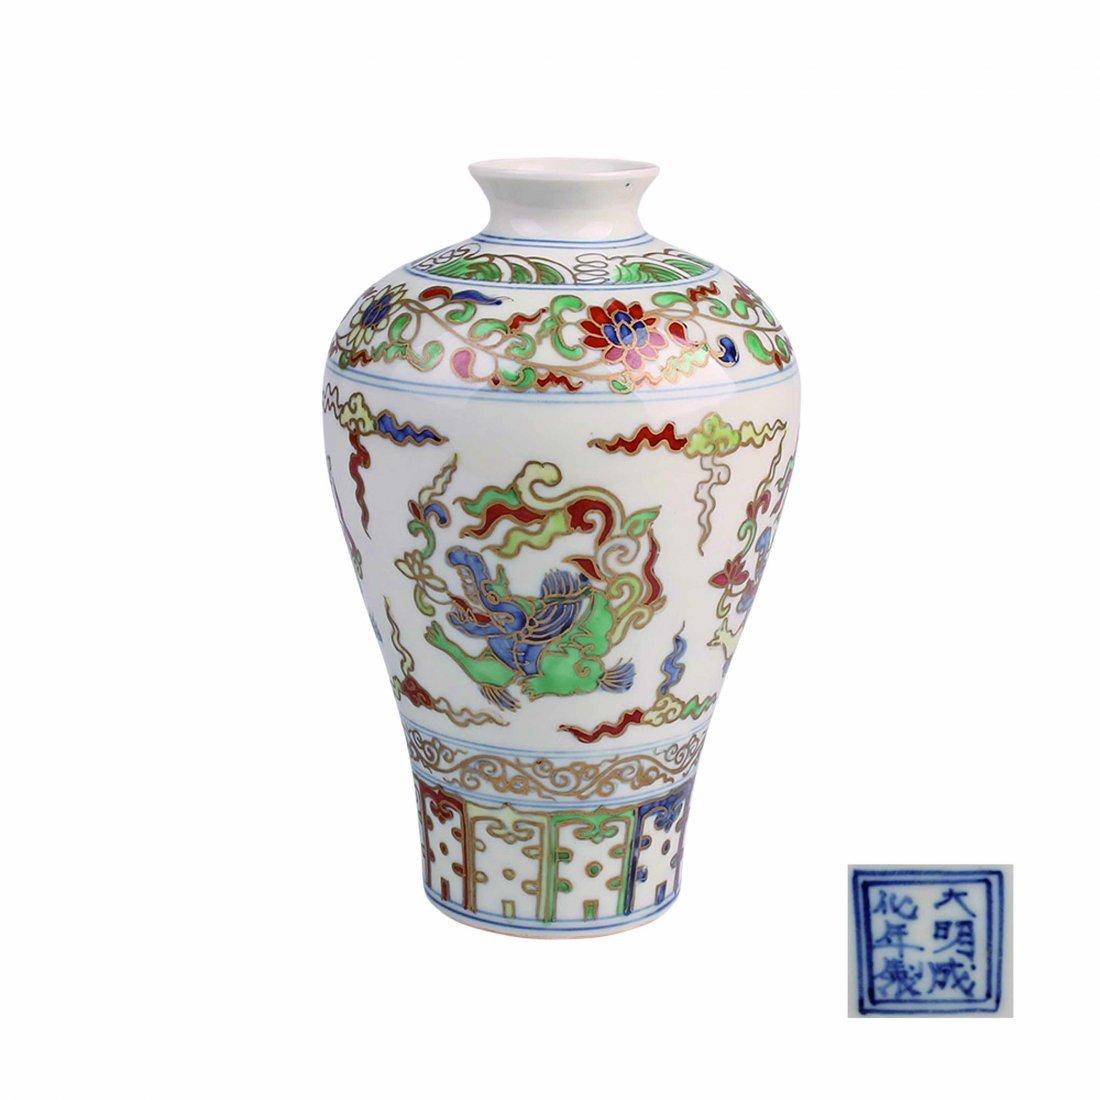 Doucai Gilt Dragon 'Meiping' Vase Chenhua